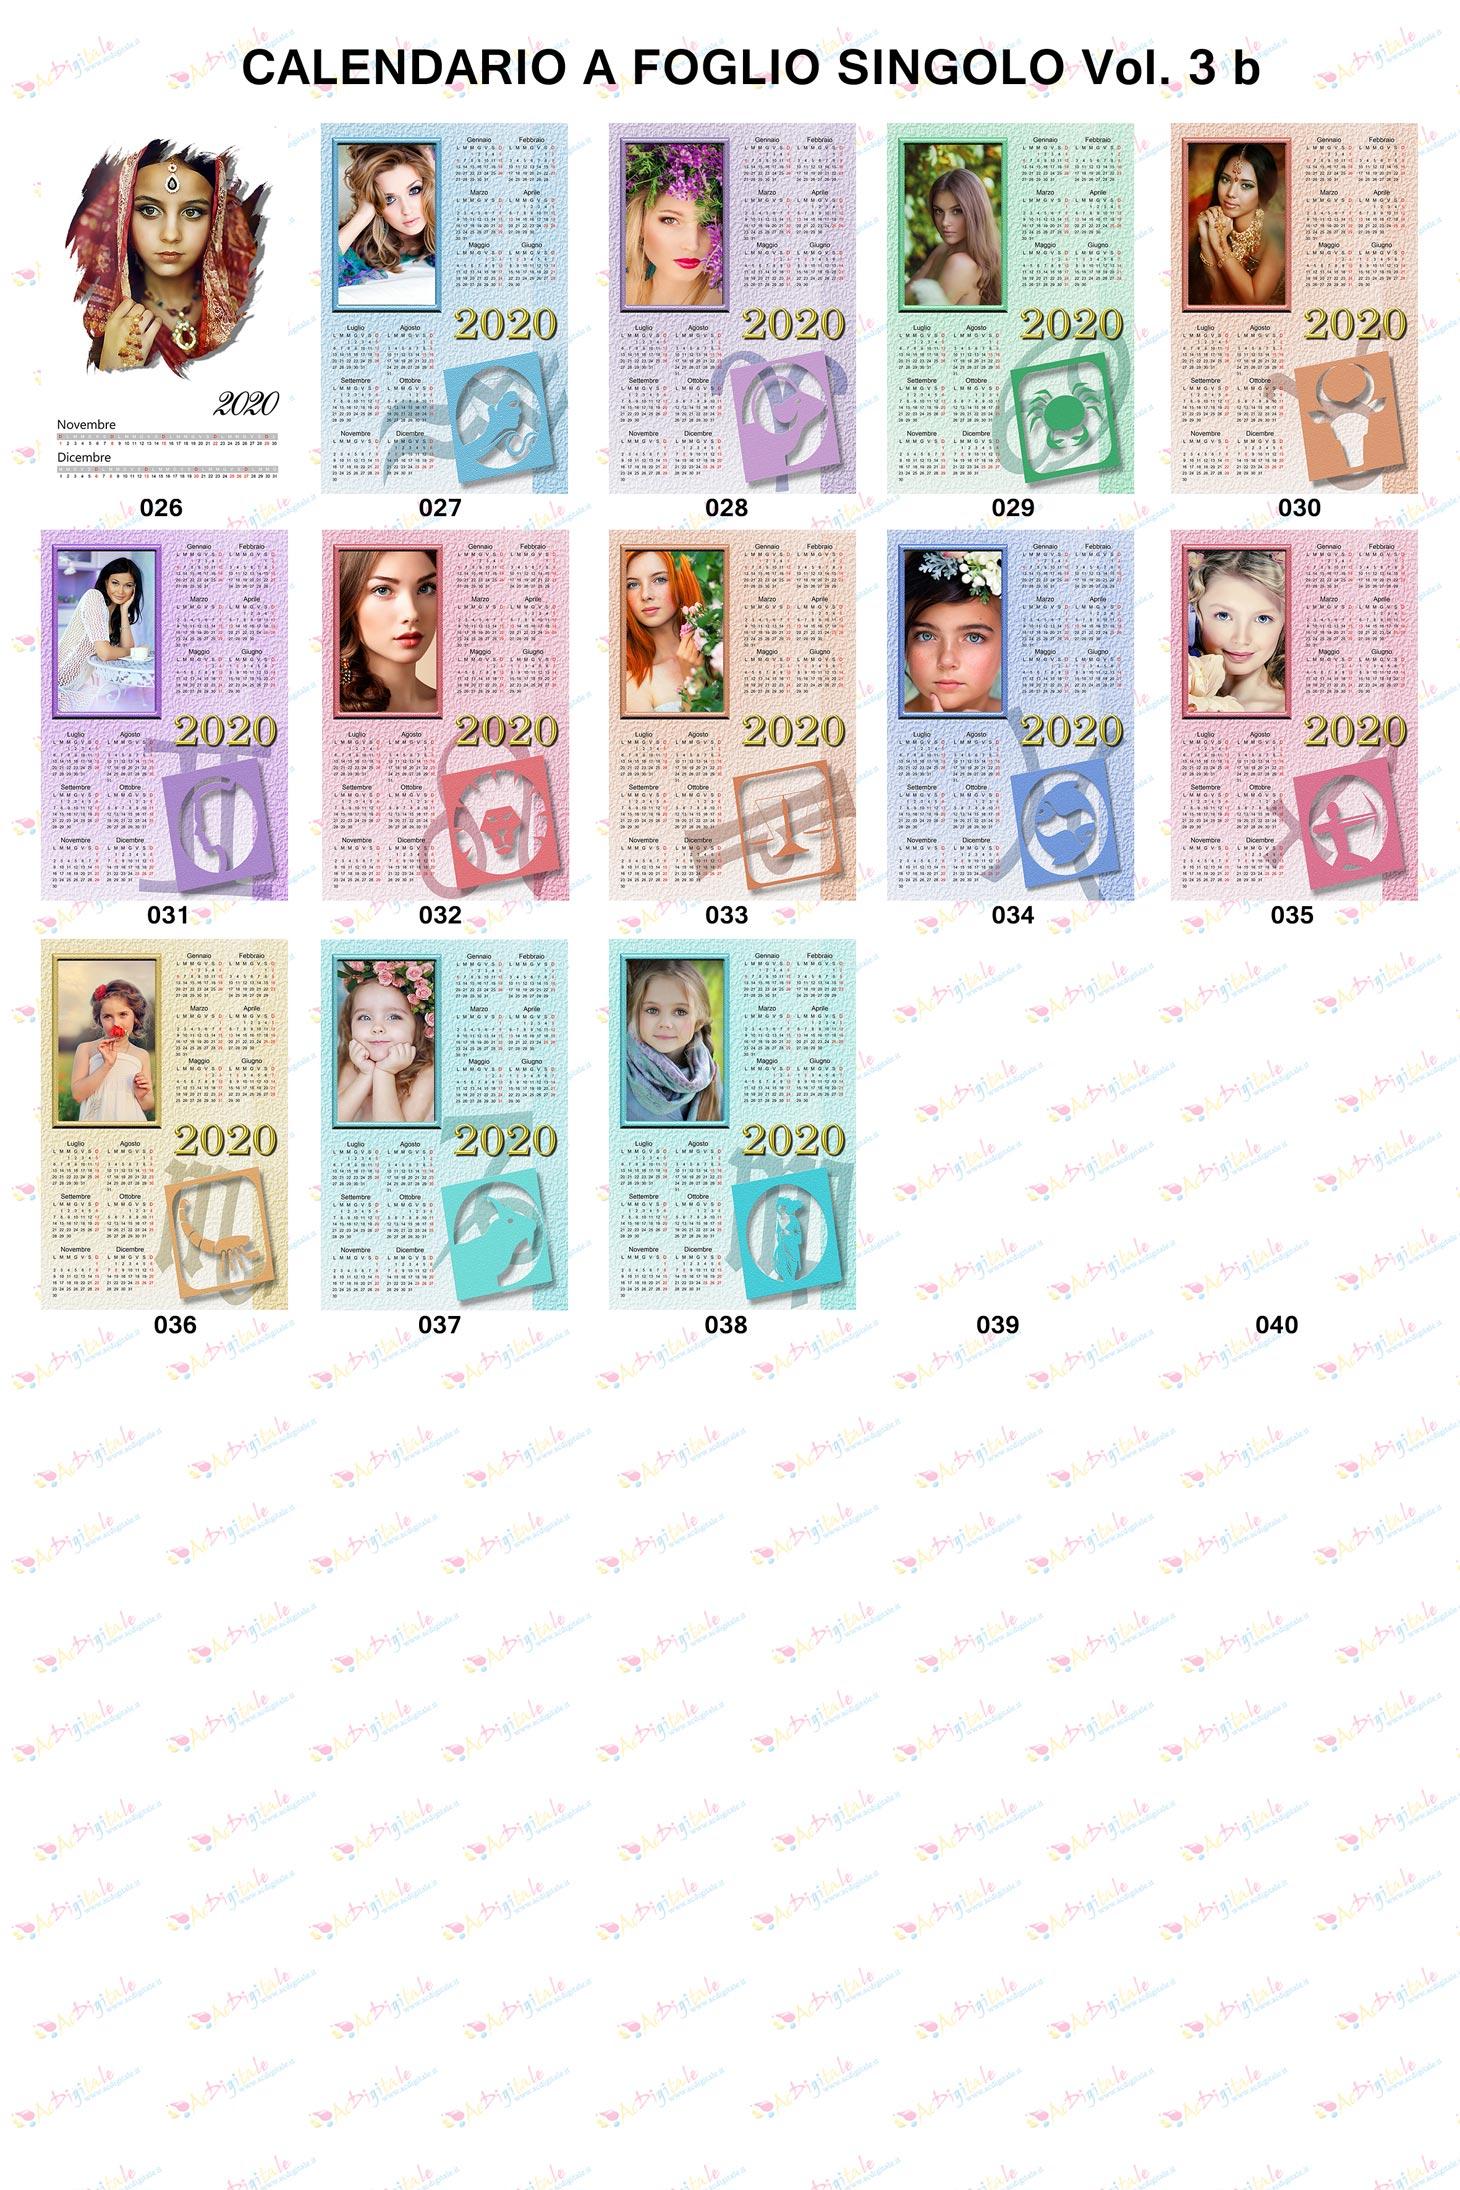 Anteprima Calendari personalizzati 2020 Volume 3b